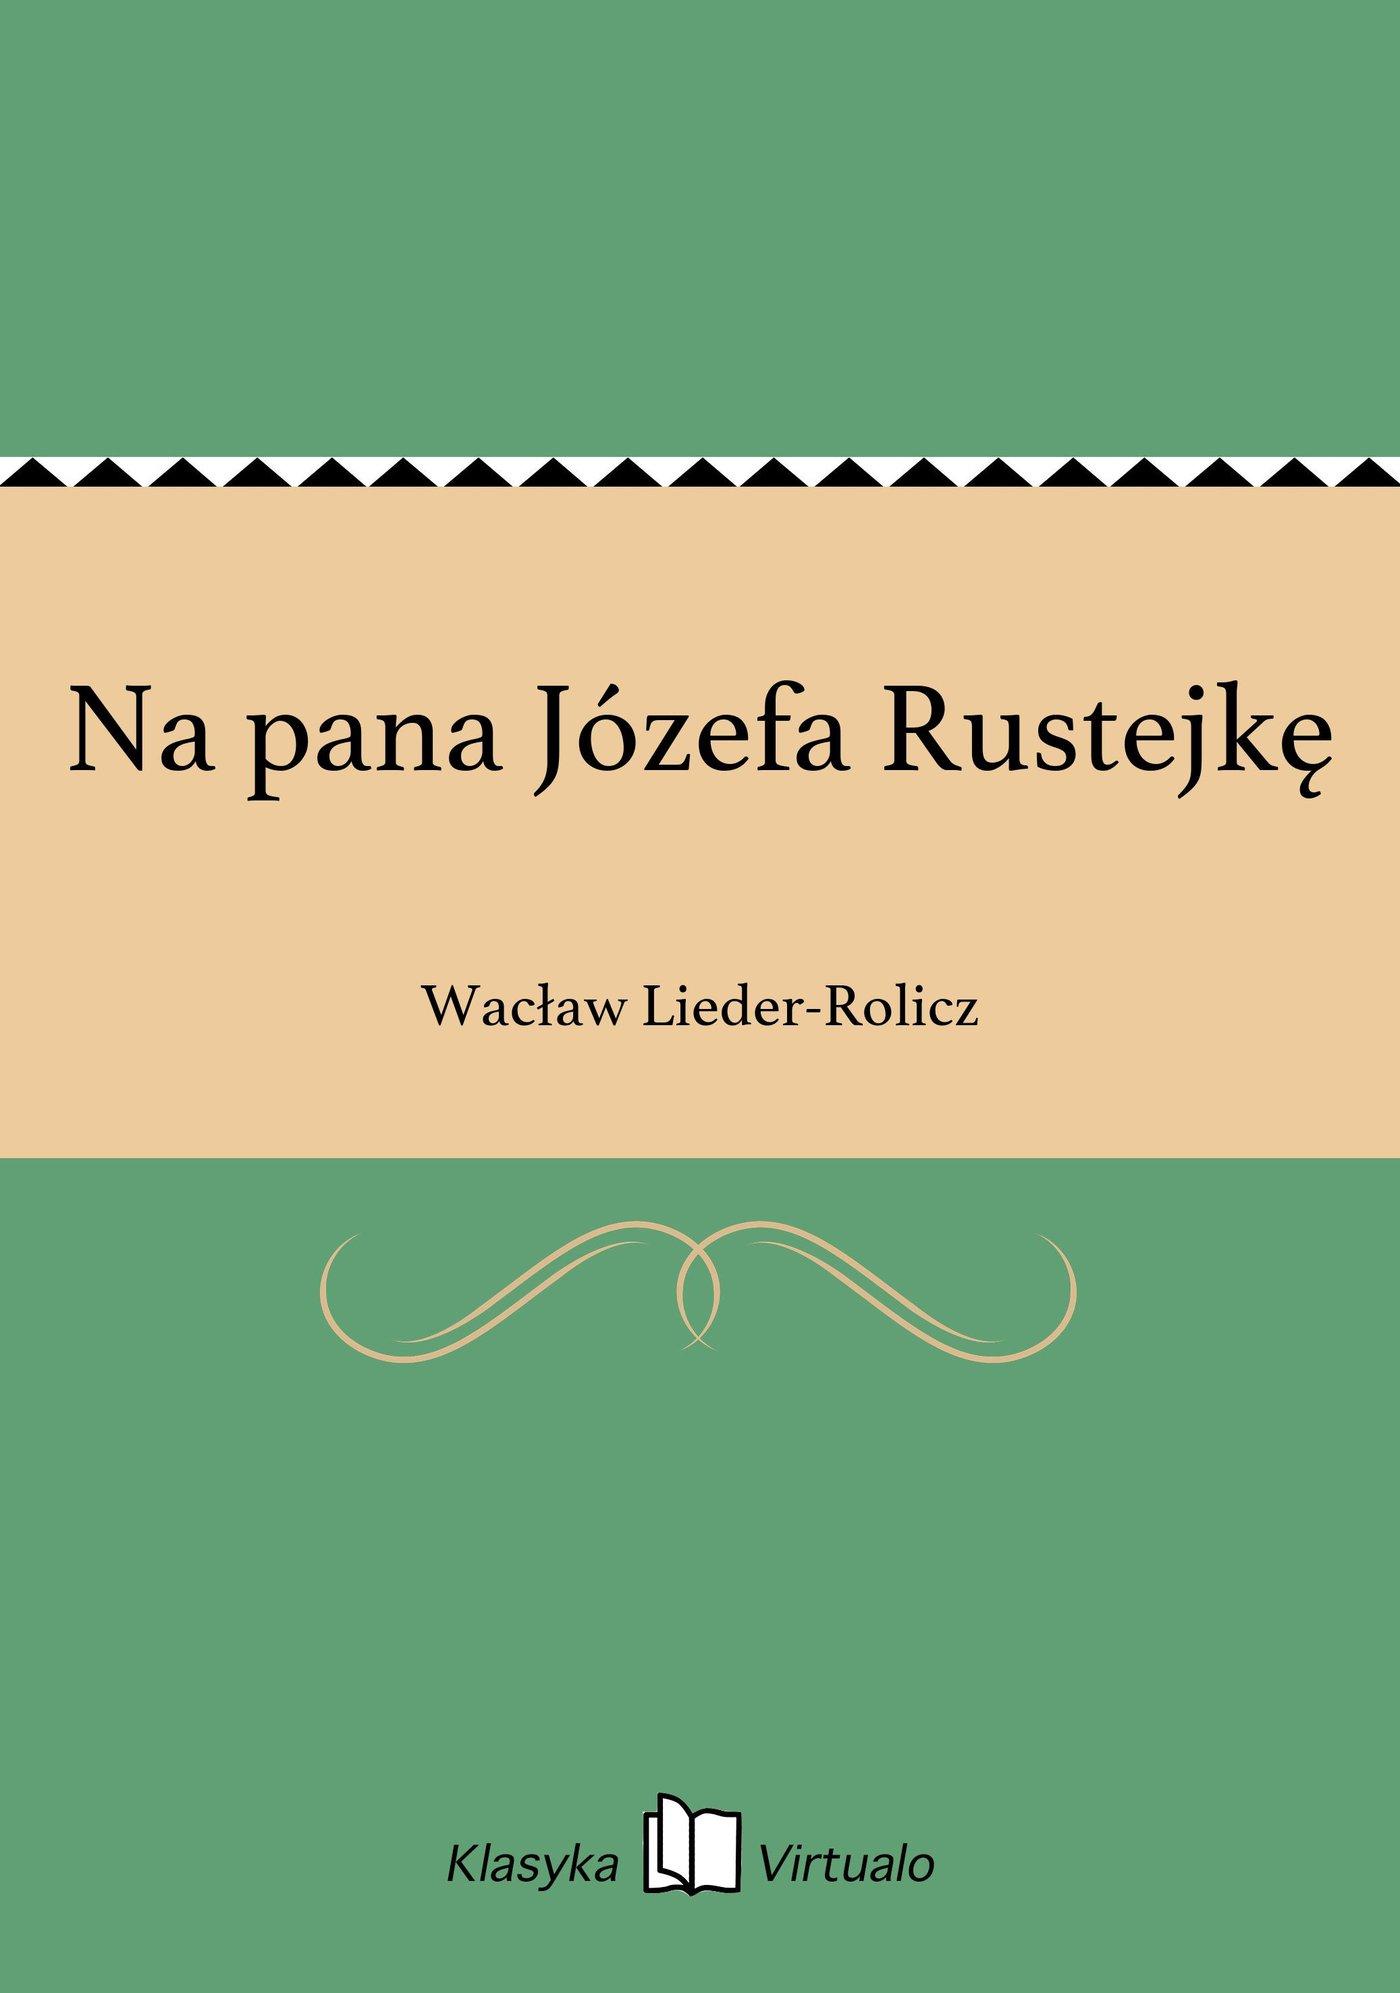 Na pana Józefa Rustejkę - Ebook (Książka na Kindle) do pobrania w formacie MOBI